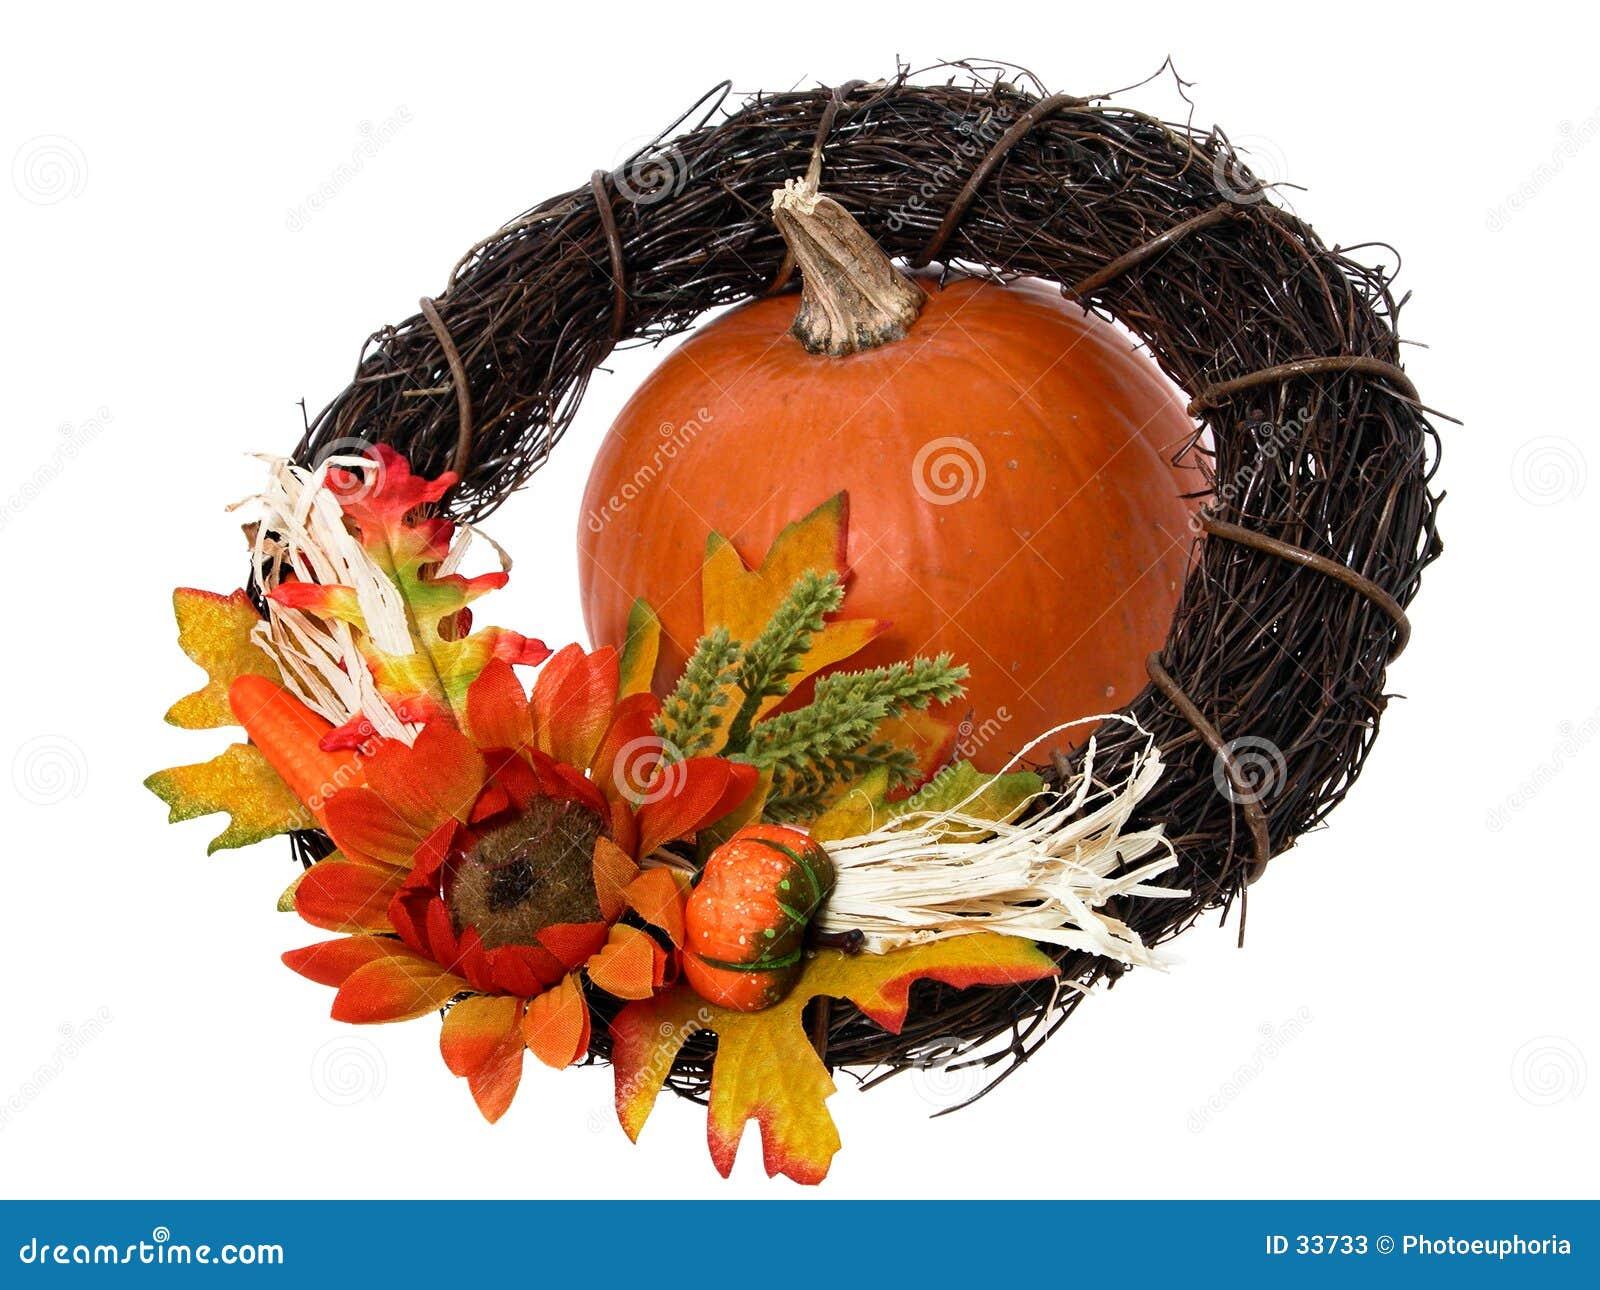 Pumpkin & Wreath